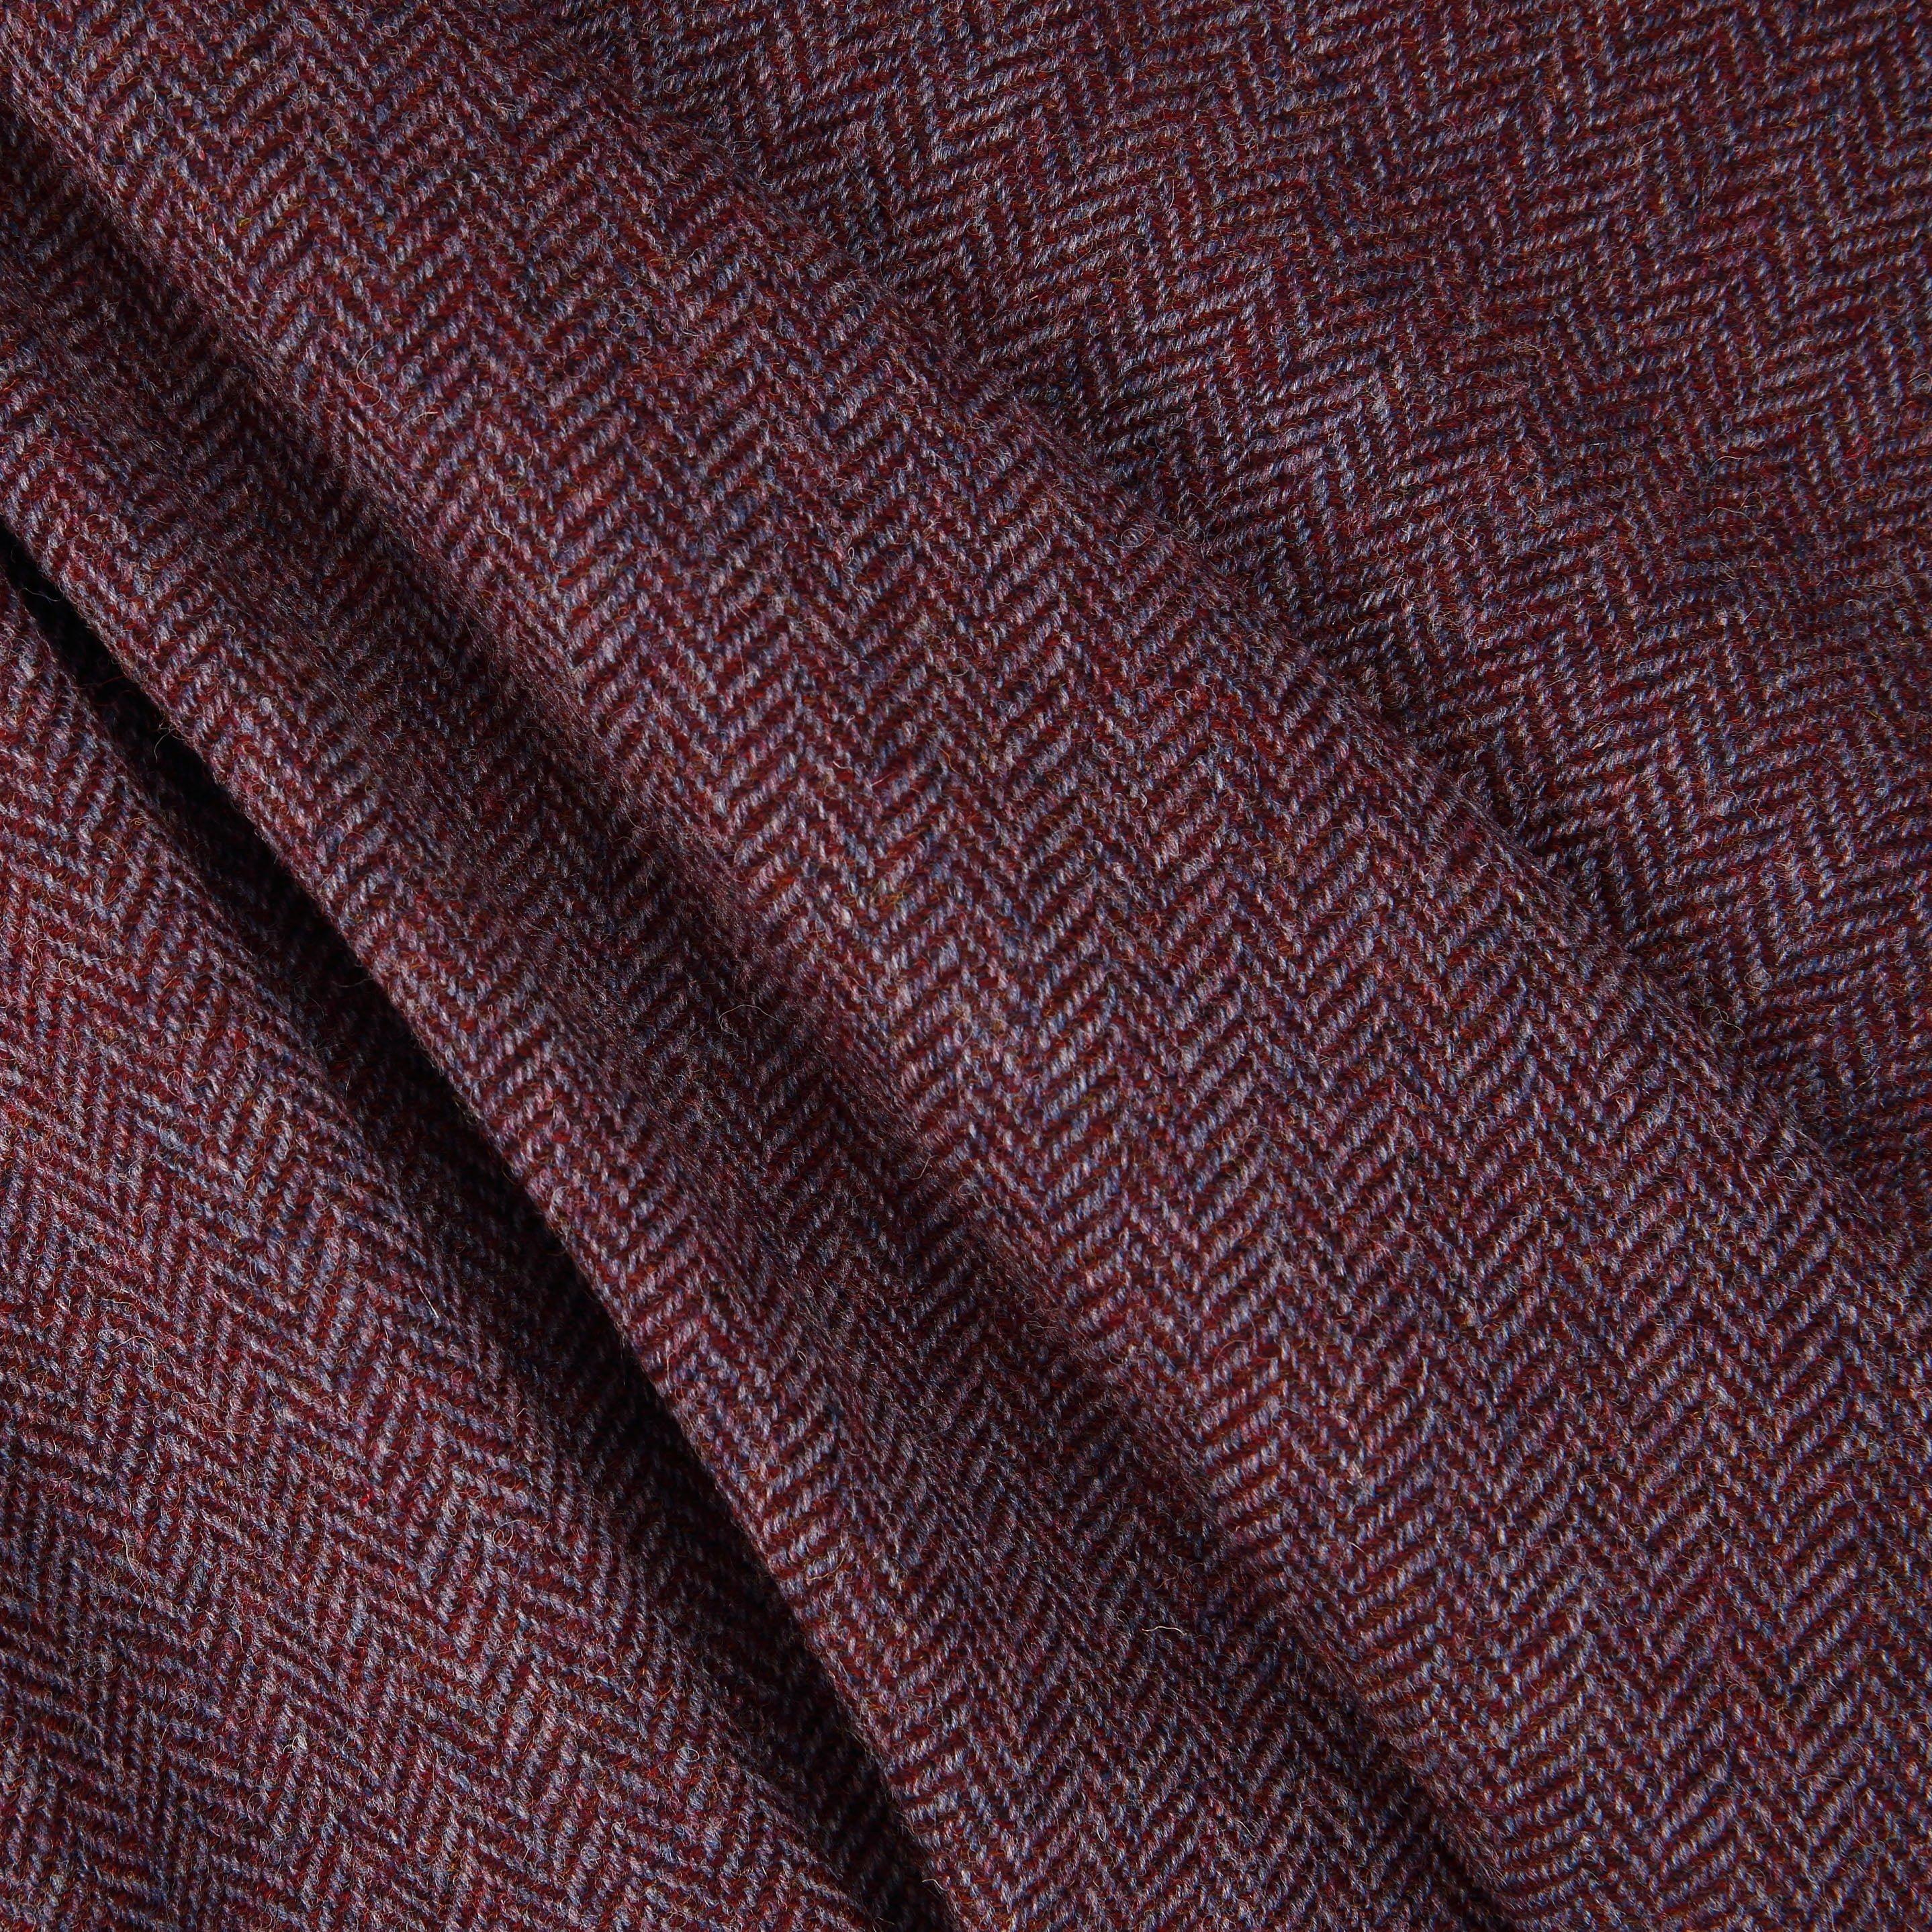 linton-wine-herringbone-bloomsbury-square-fabrics-3012